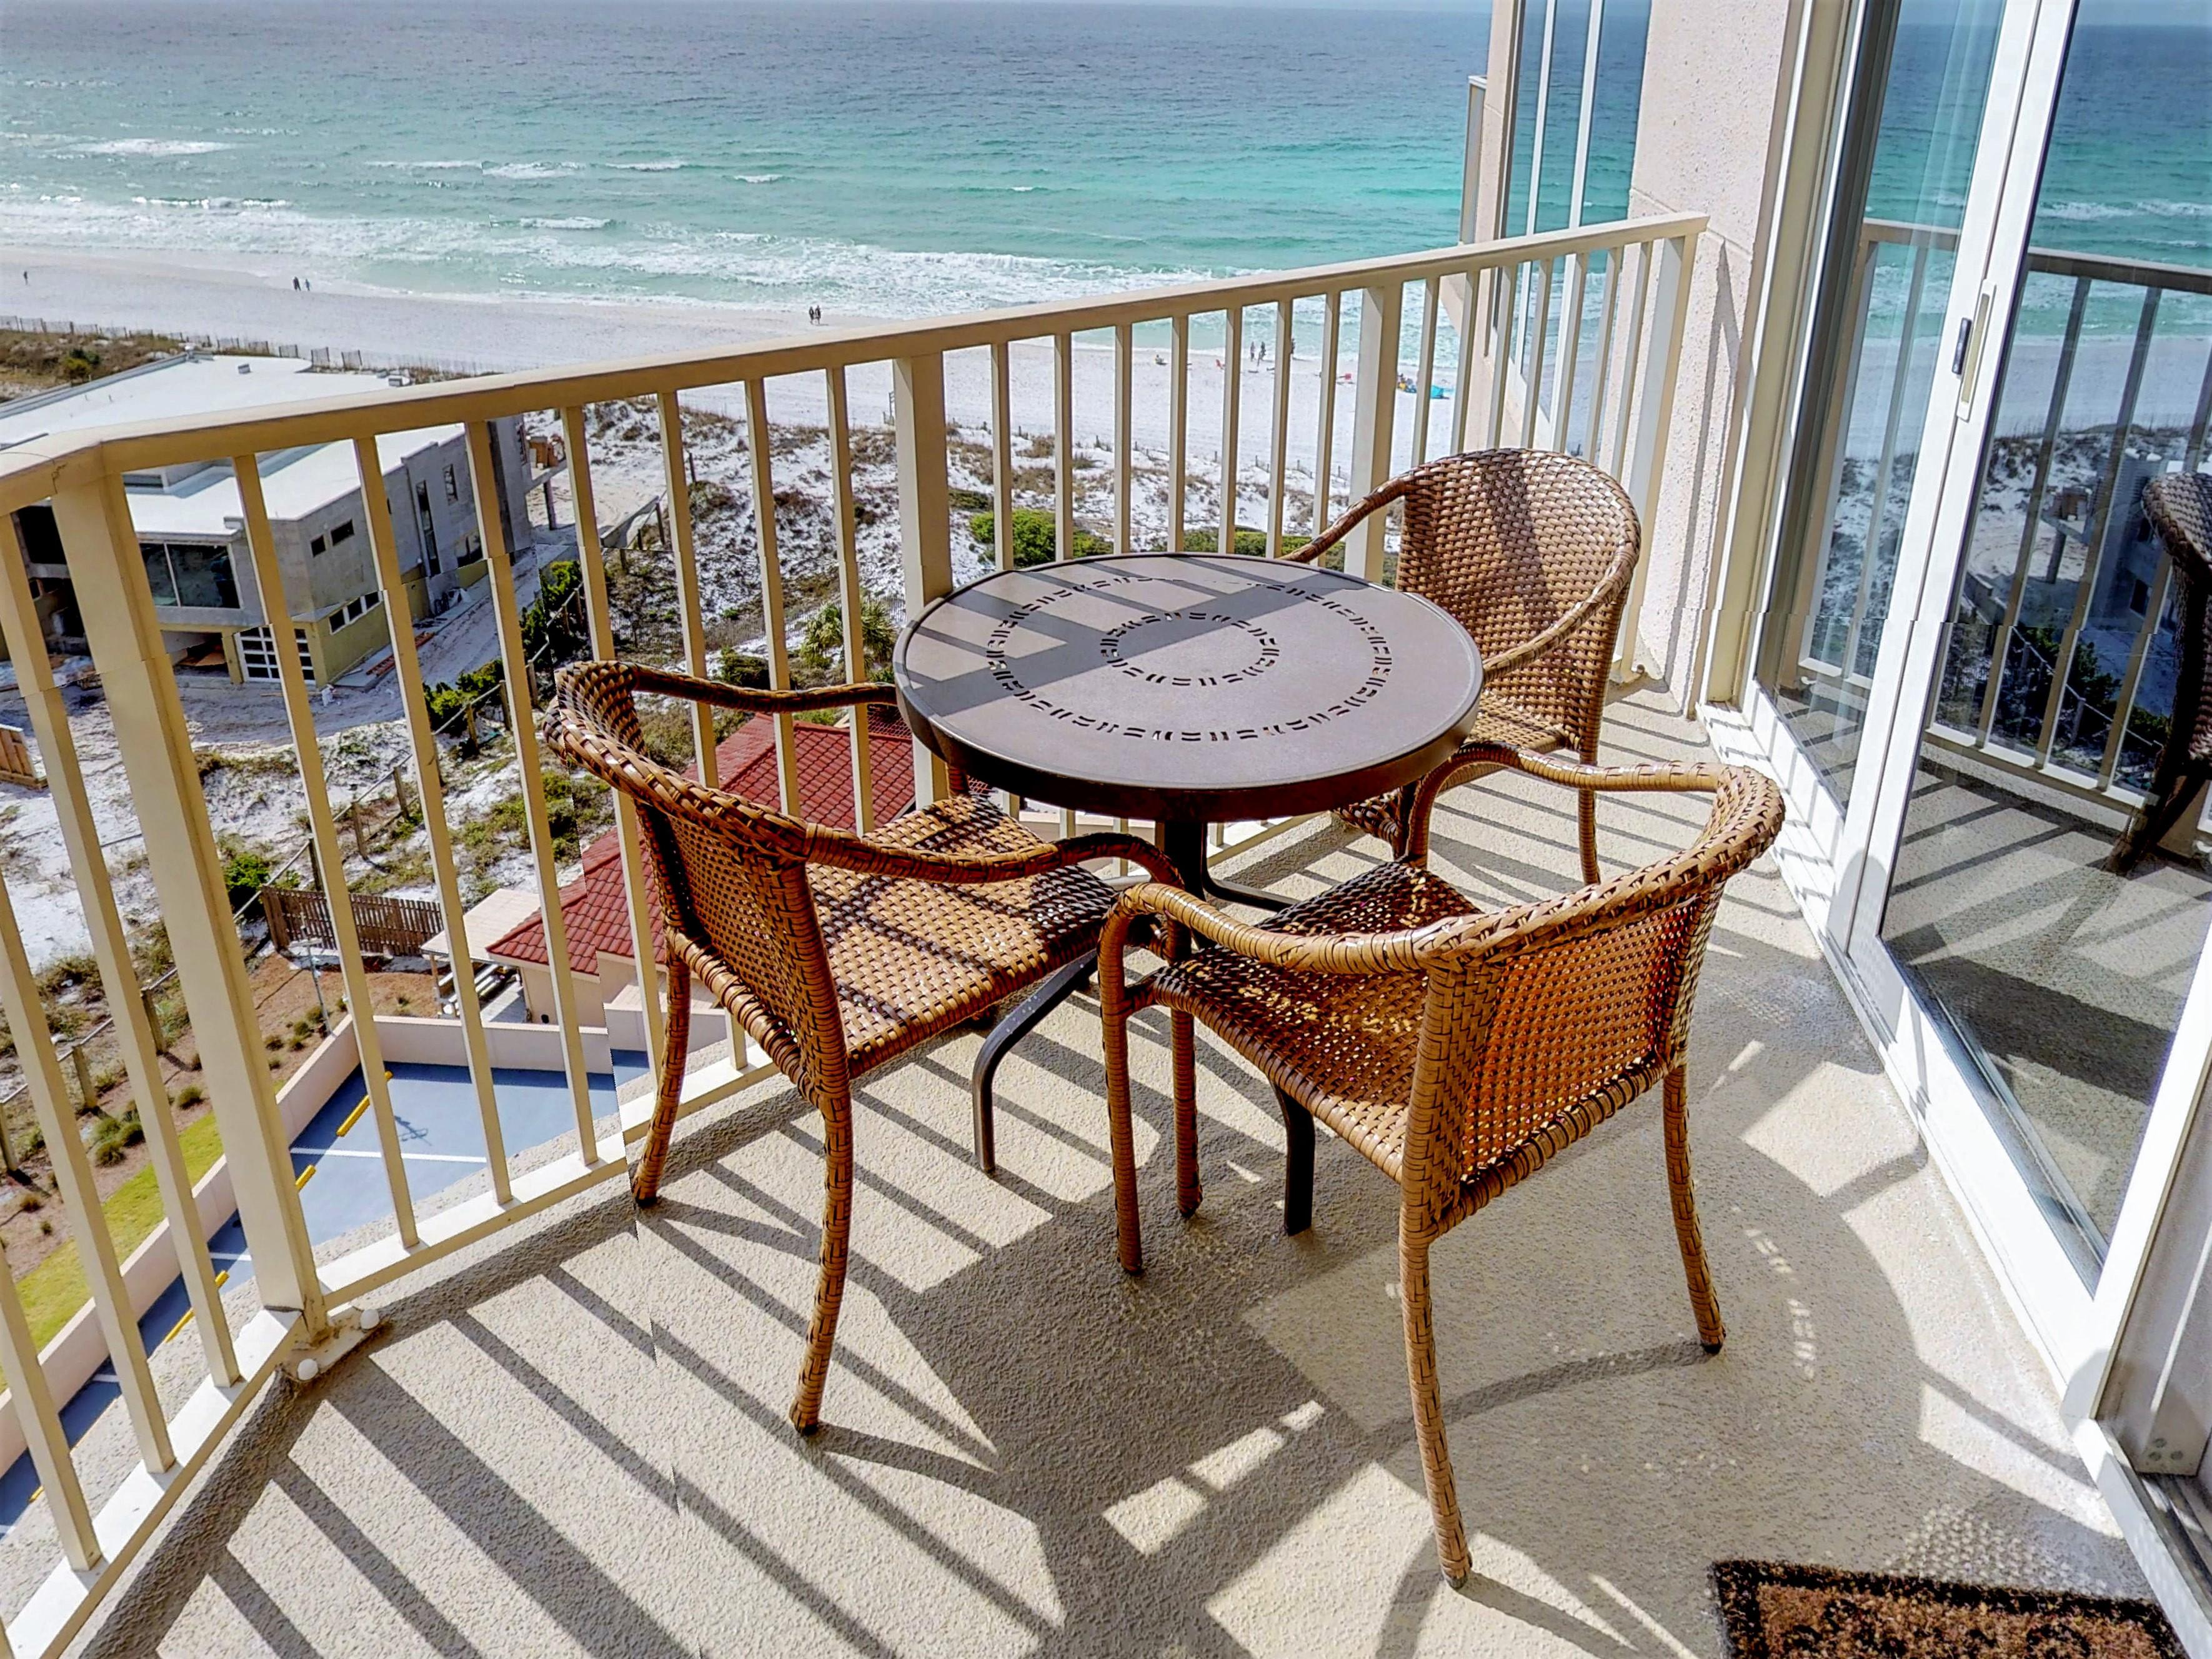 905 Tops'l Beach Manor Condo rental in TOPS'L Beach Manor  in Destin Florida - #19